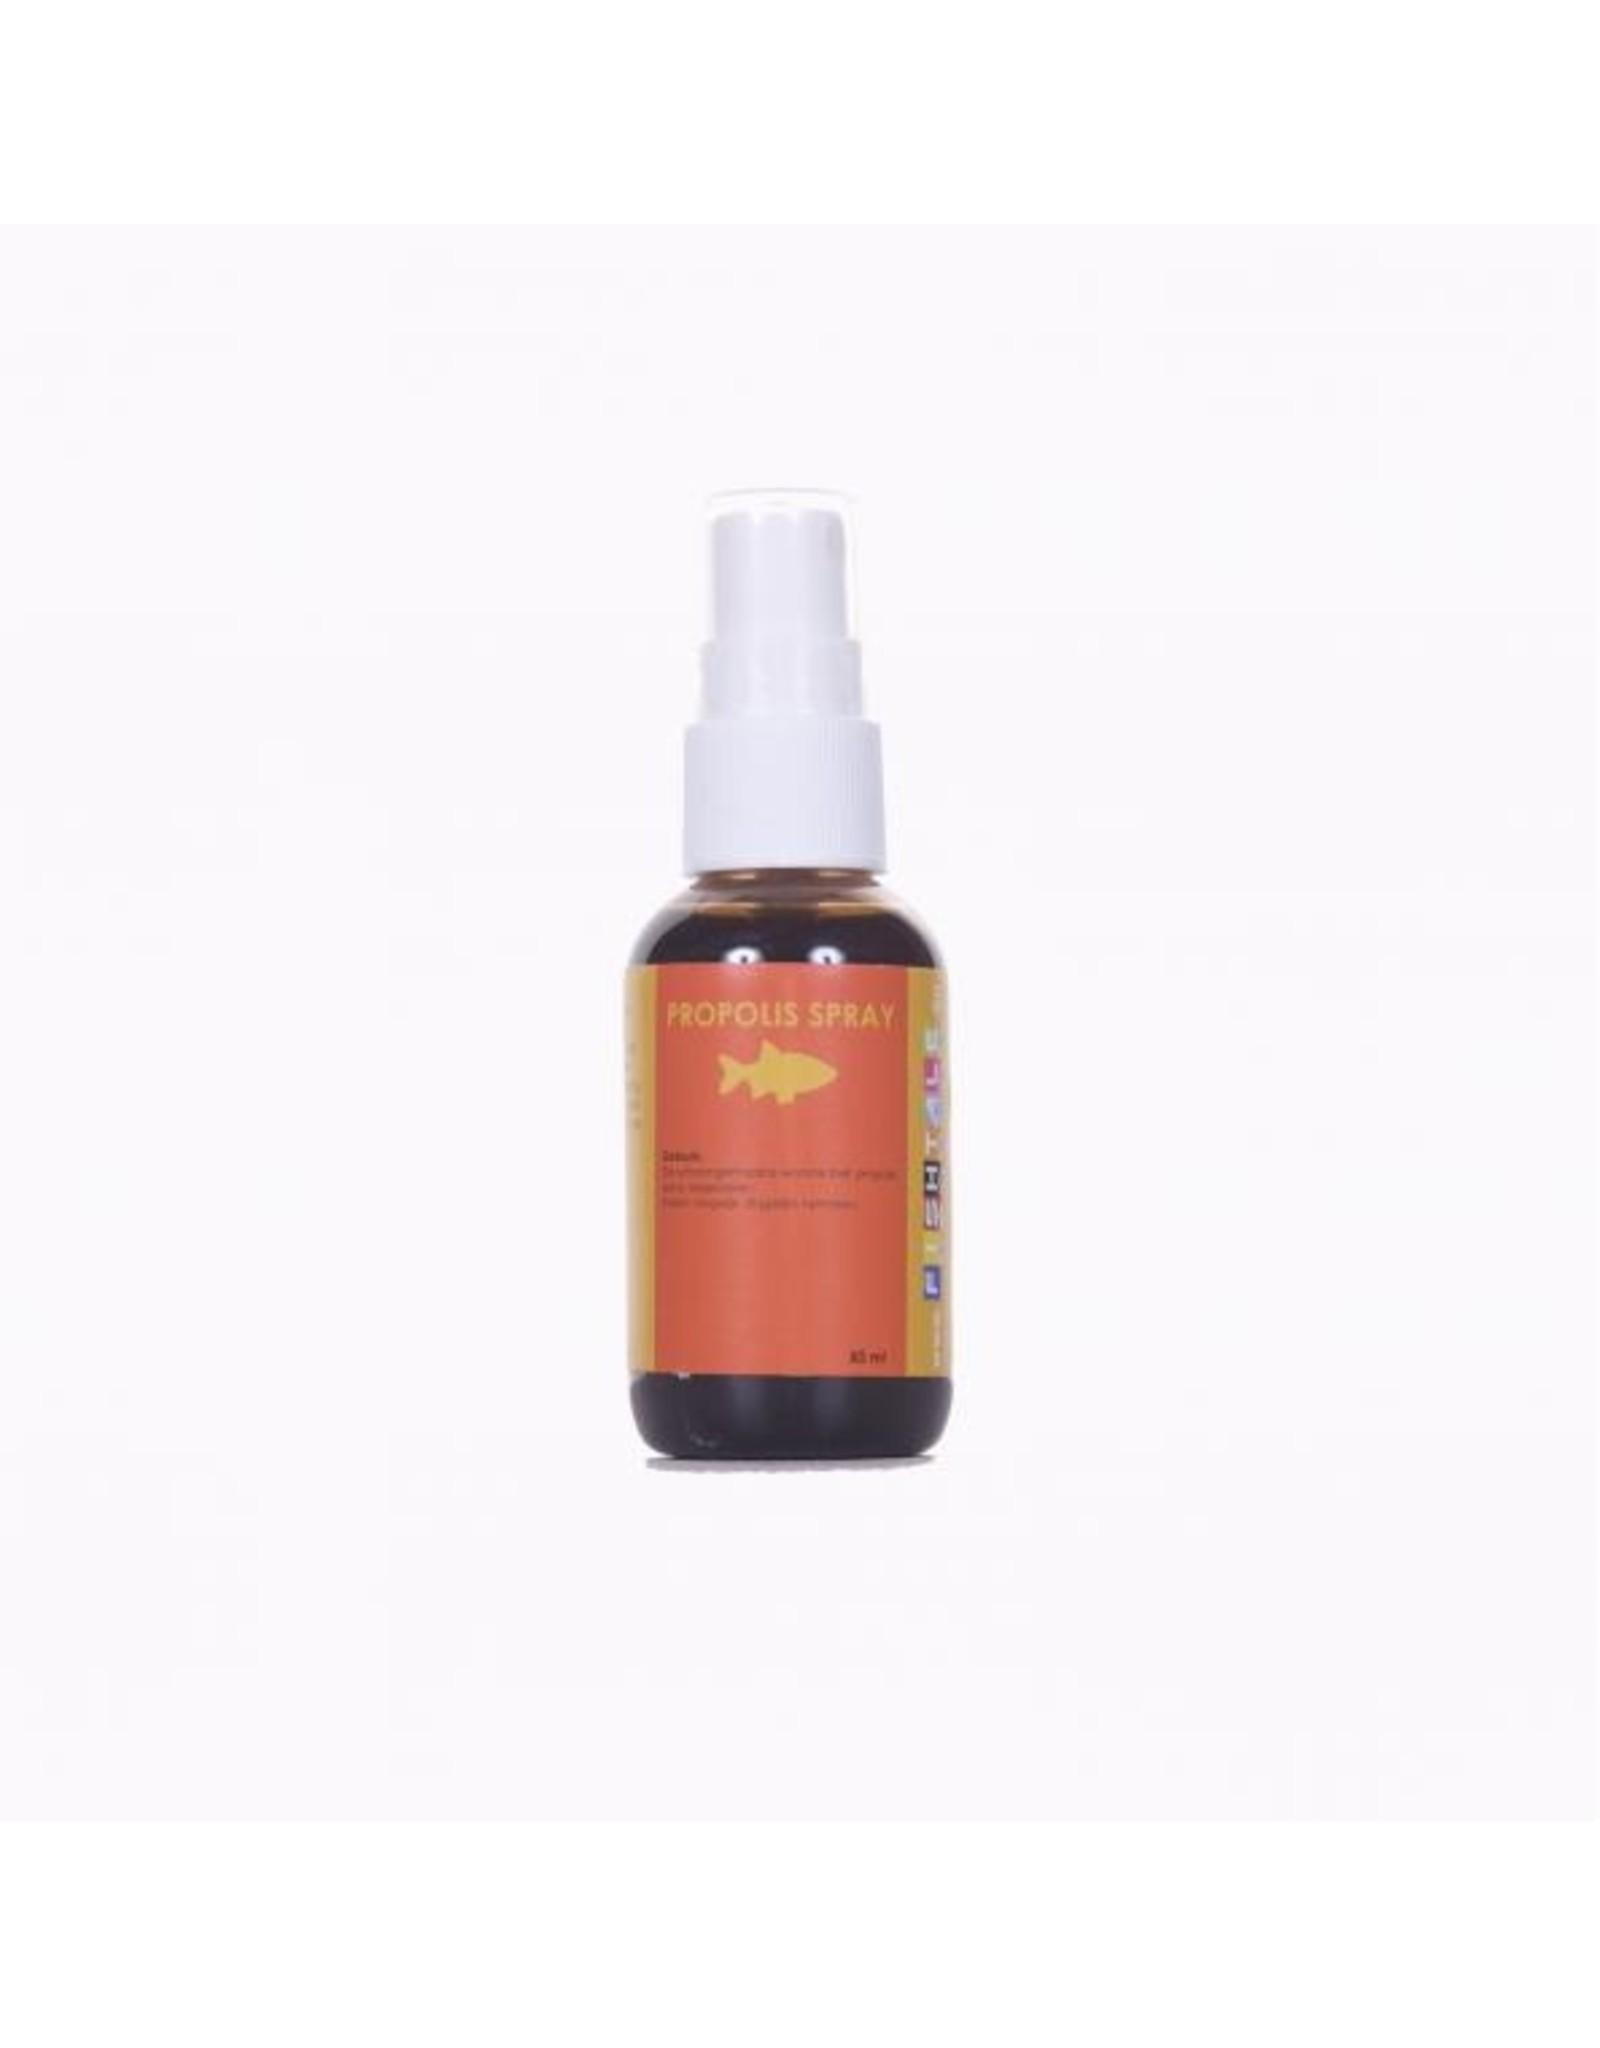 Malamix Malamix Propolis Spray